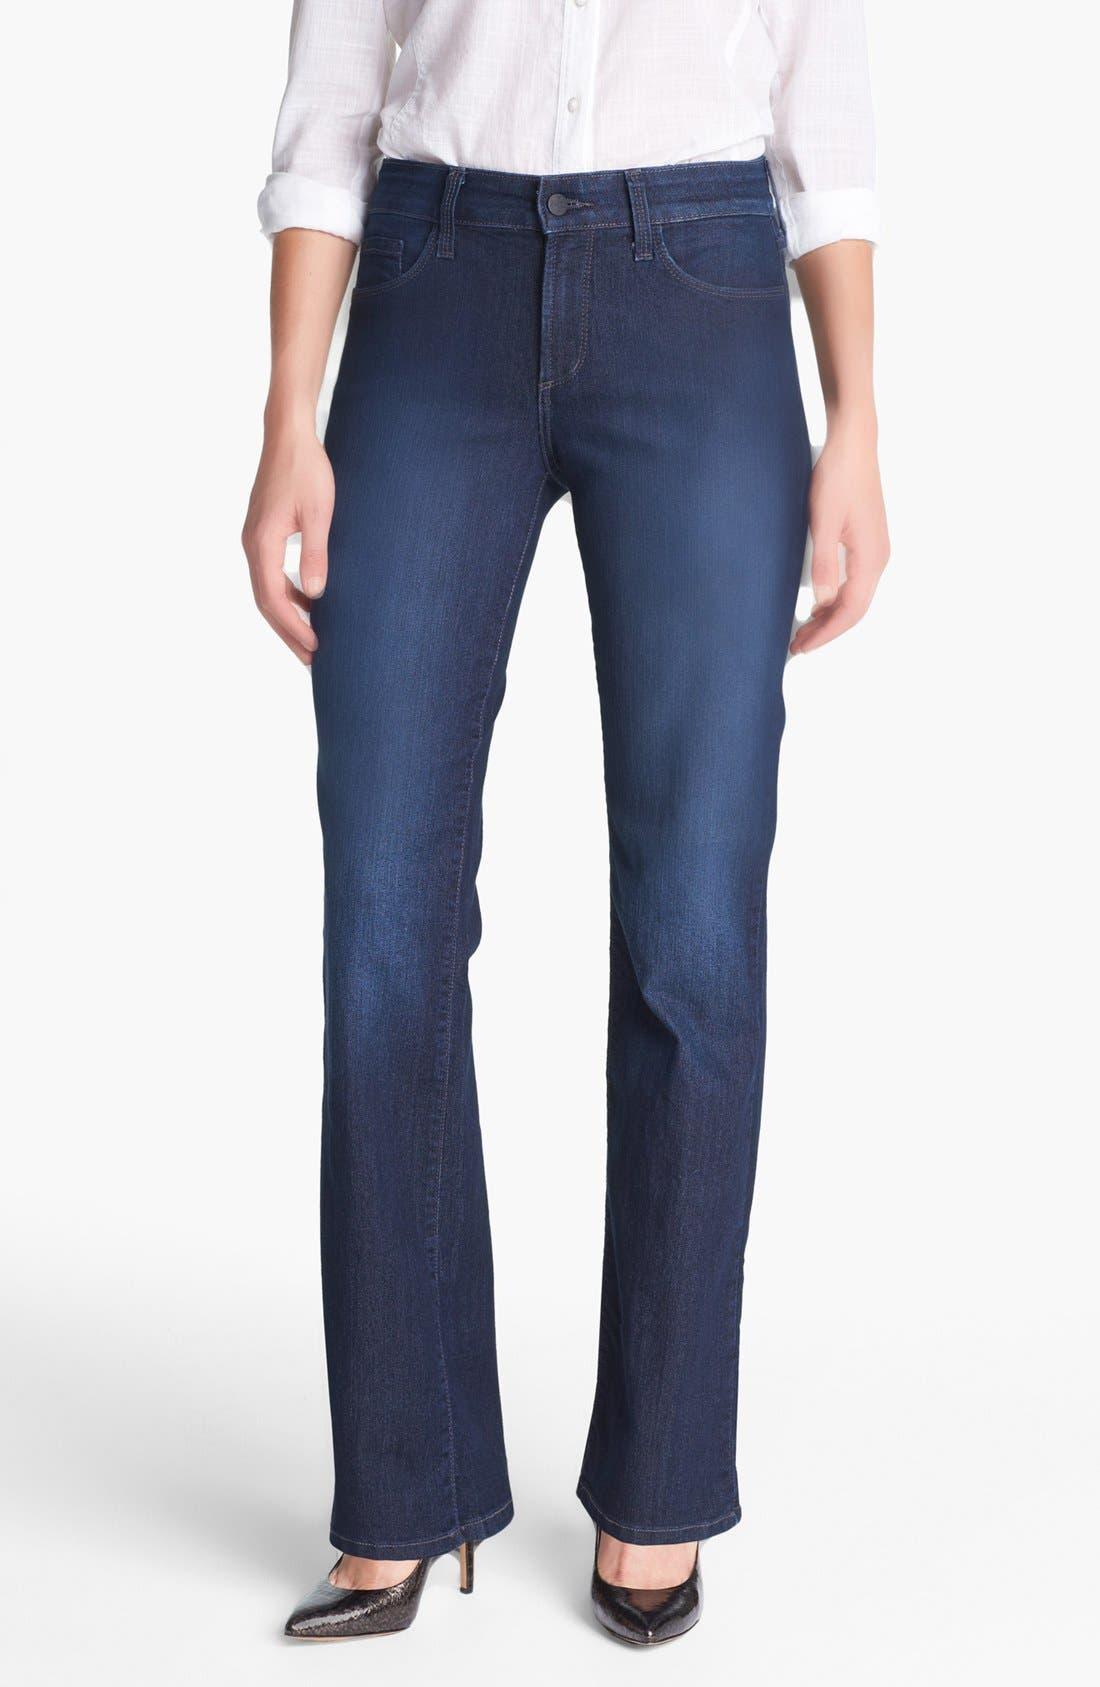 Alternate Image 1 Selected - NYDJ 'Barbara' Embellished Stretch Bootcut Jeans (Burbank)